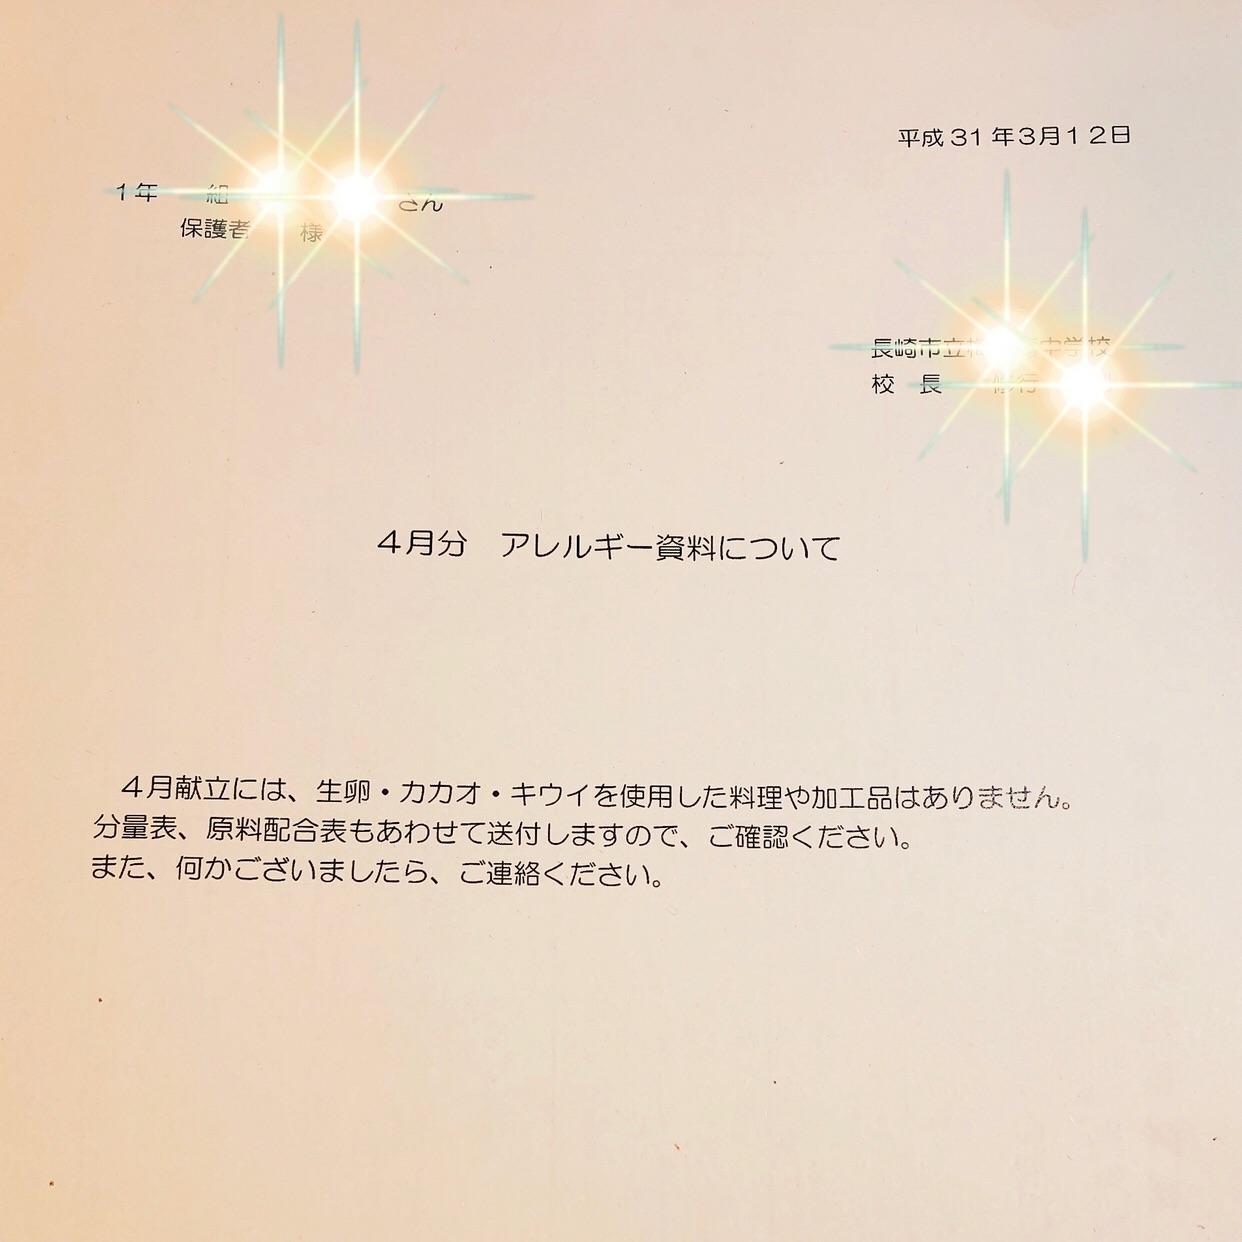 f:id:allergy_nagasakikko:20190312213819j:plain